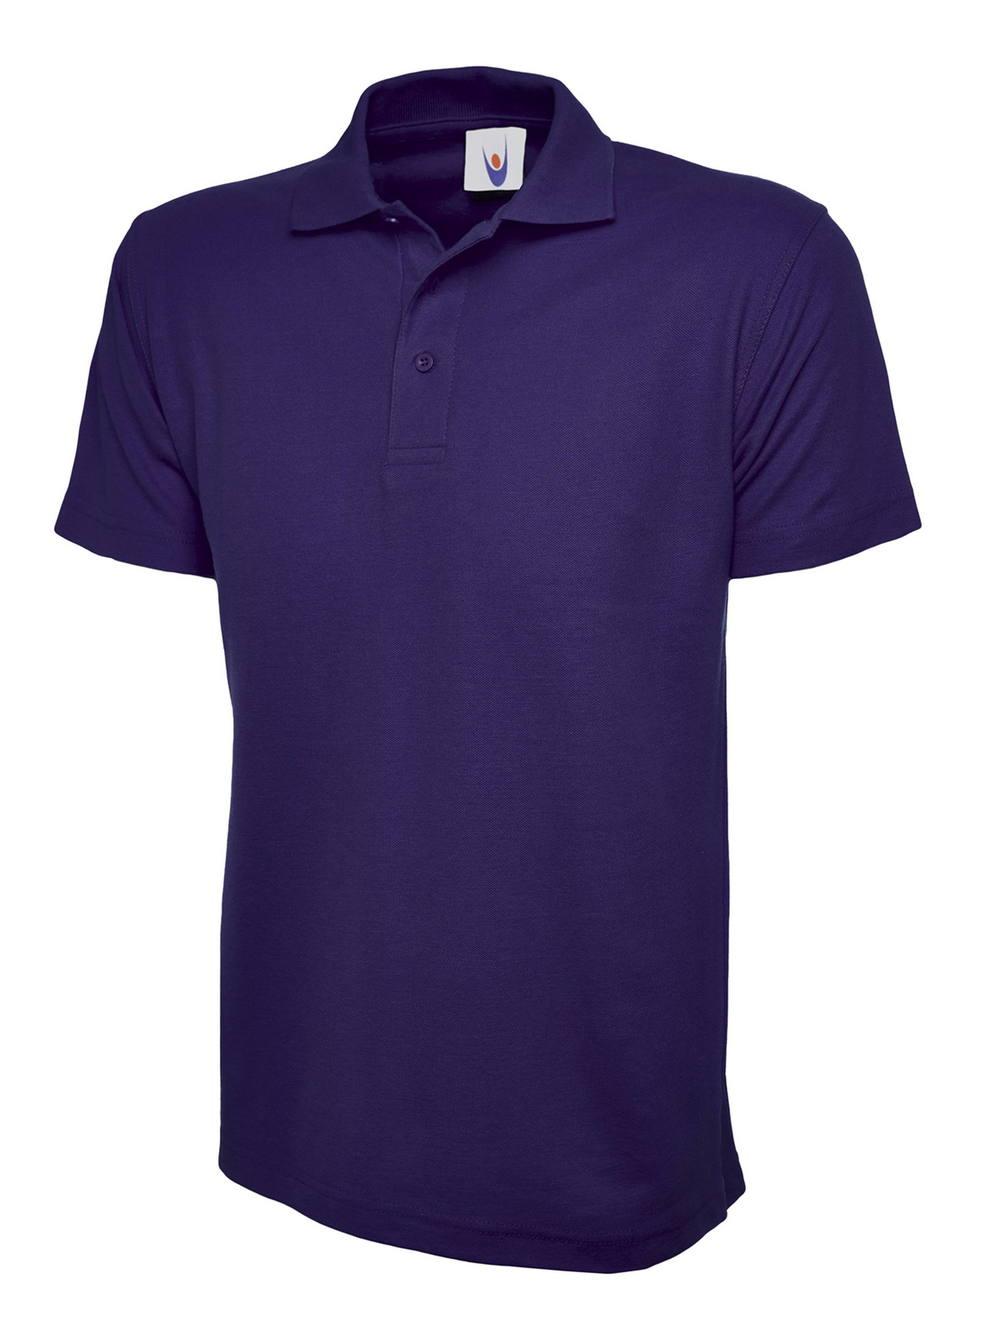 Uneek Classic Poloshirt